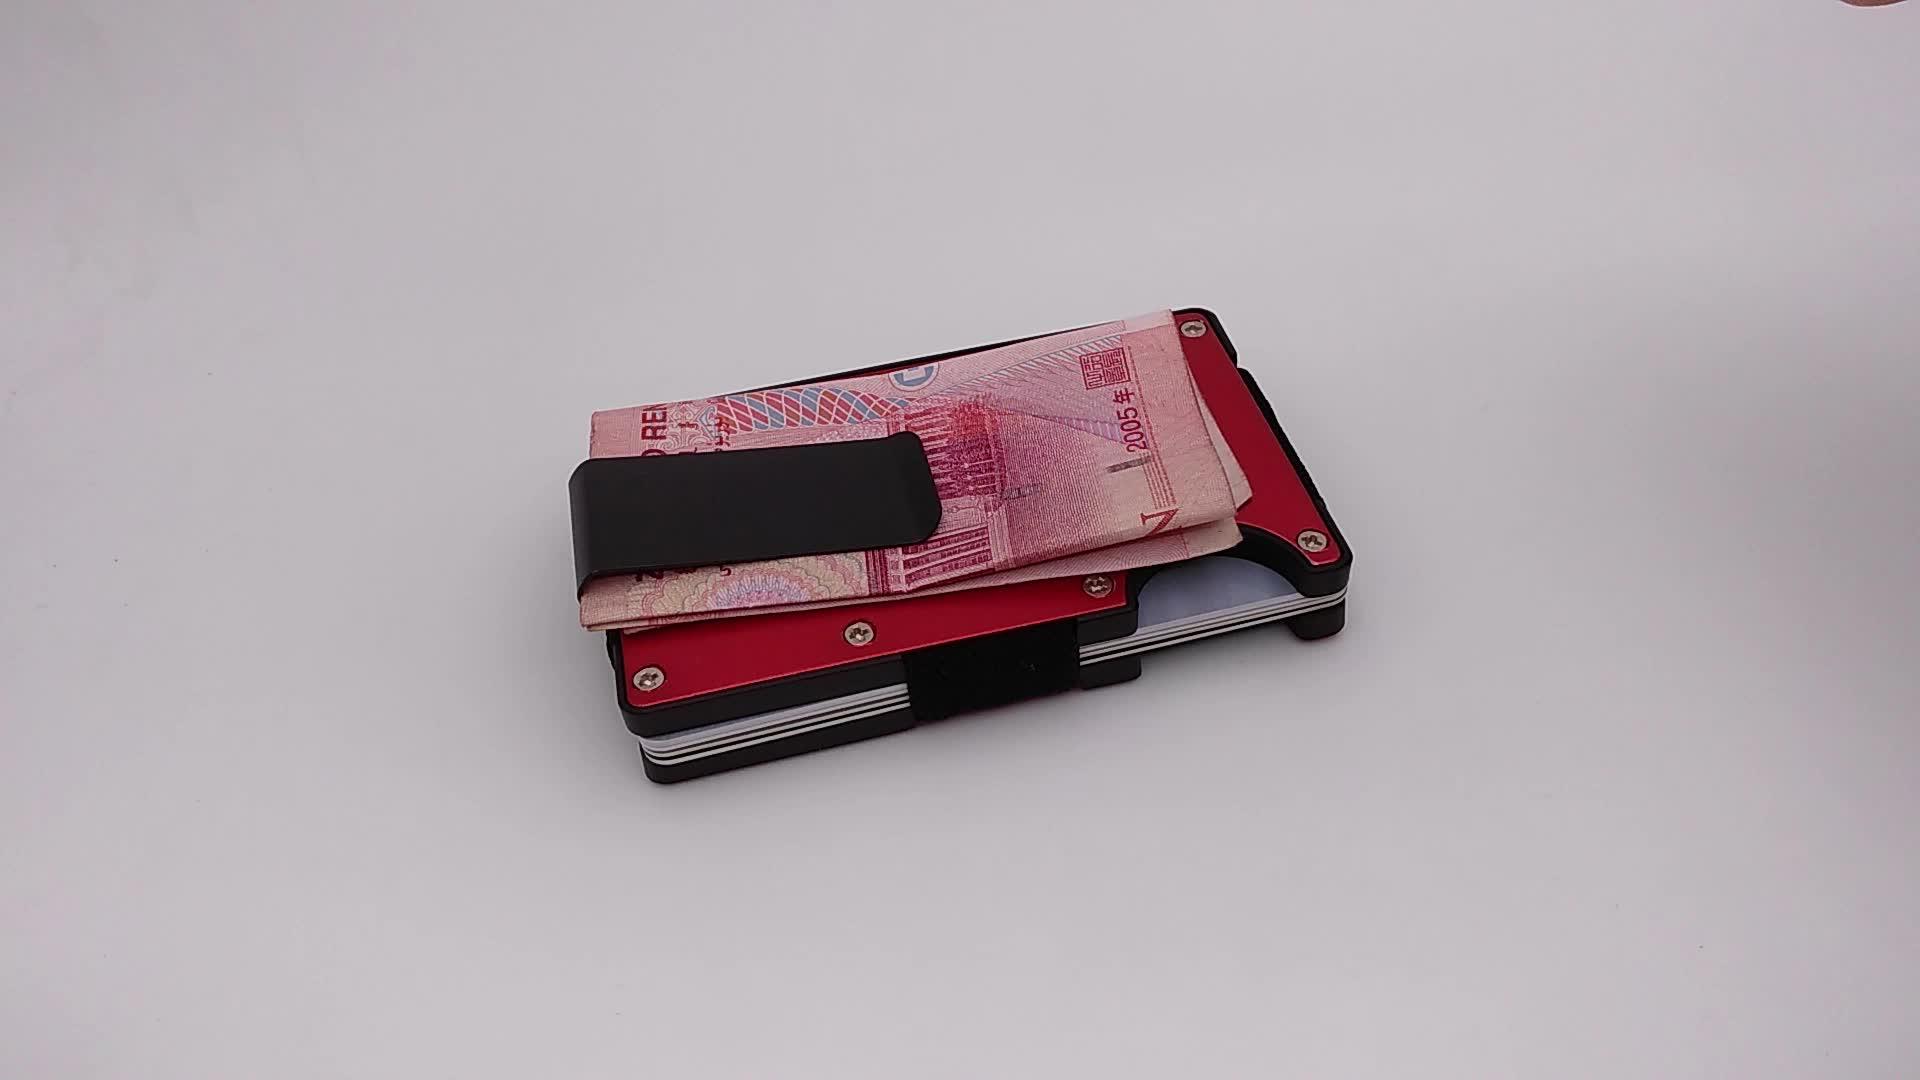 Wholesale aluminium credit card holder business gift slim pocket money clip wallet